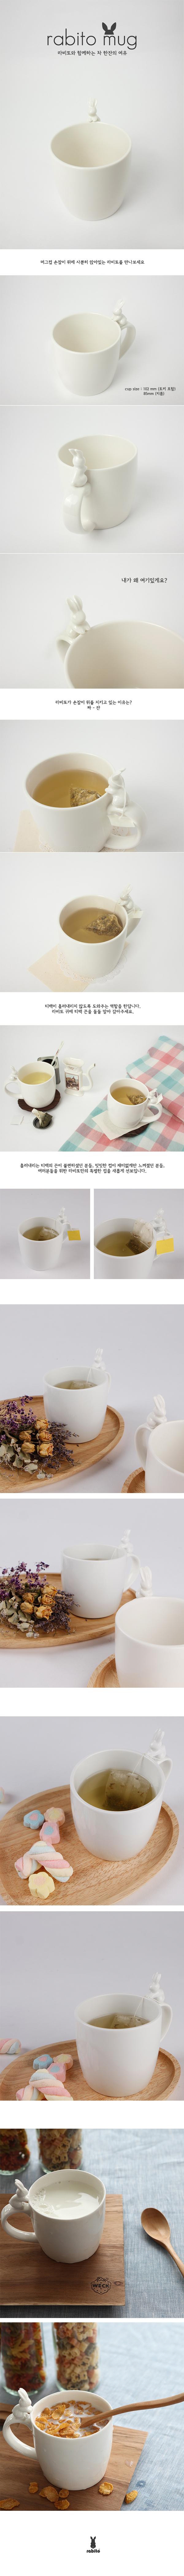 rabito MUG CUP - 라비또, 20,000원, 머그컵, 심플머그